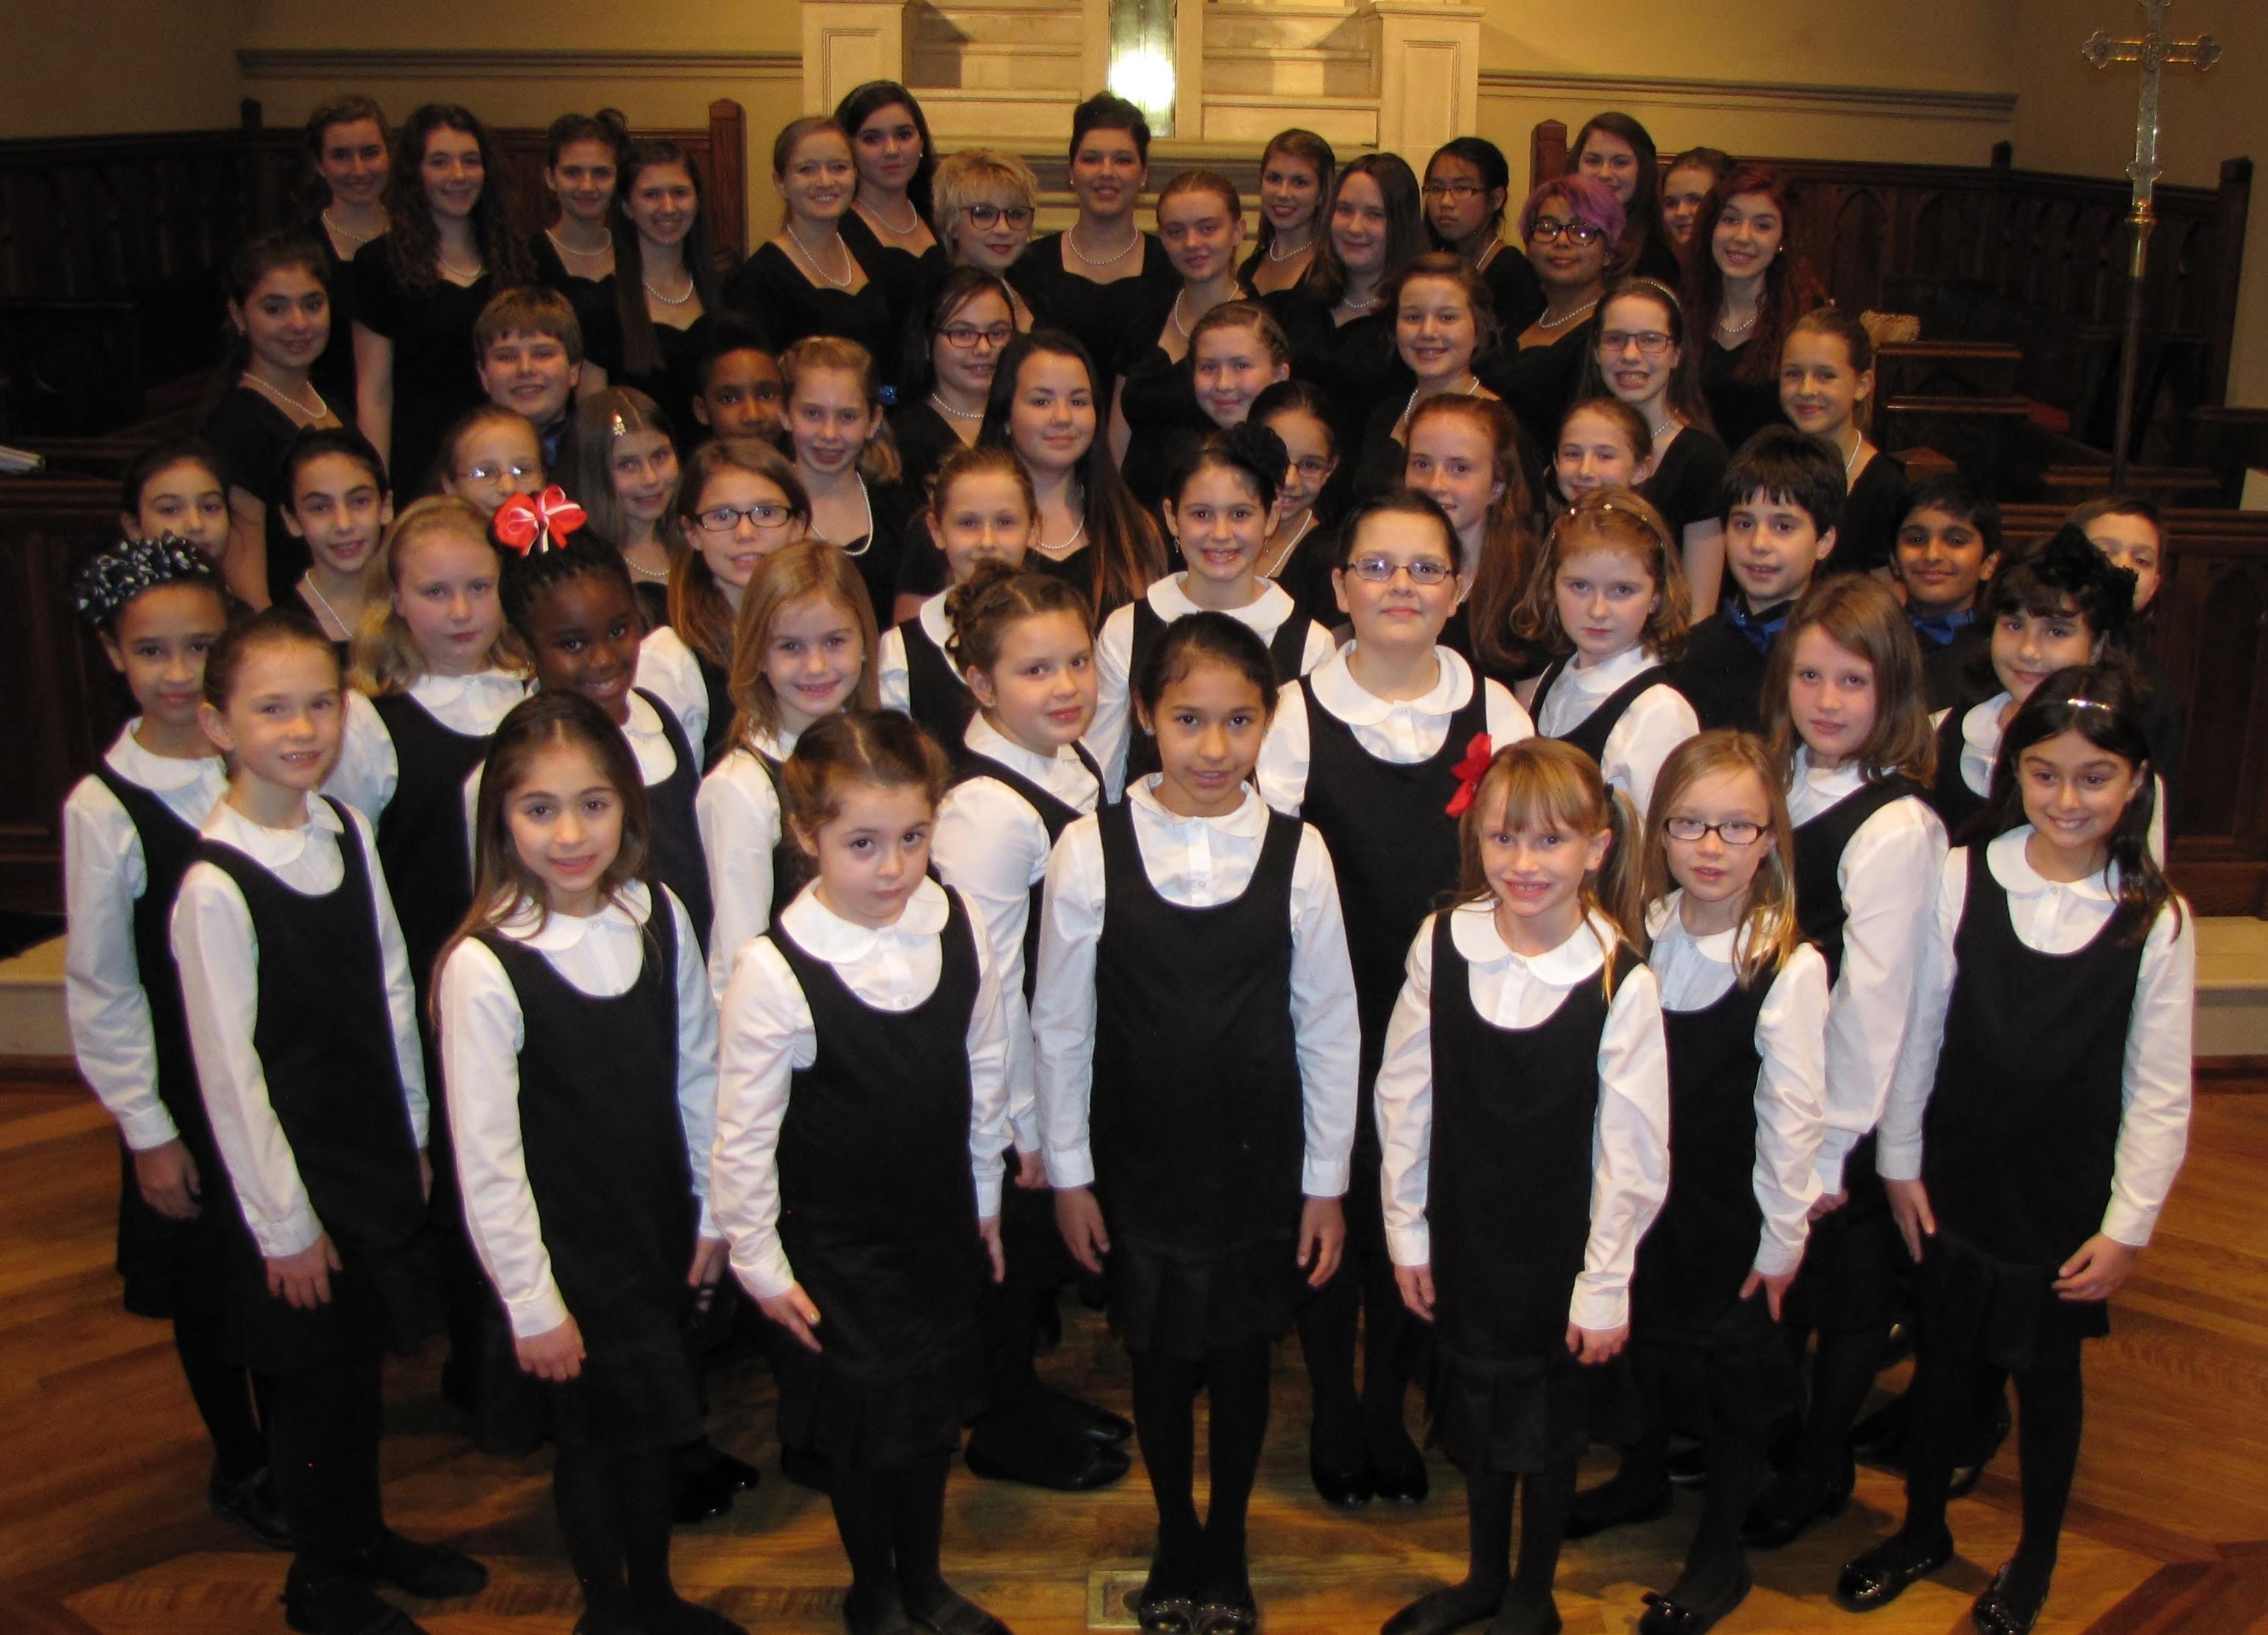 b0955651a90d7c0b5fca_Children_s_Chorus_of_Sussex_County.JPG